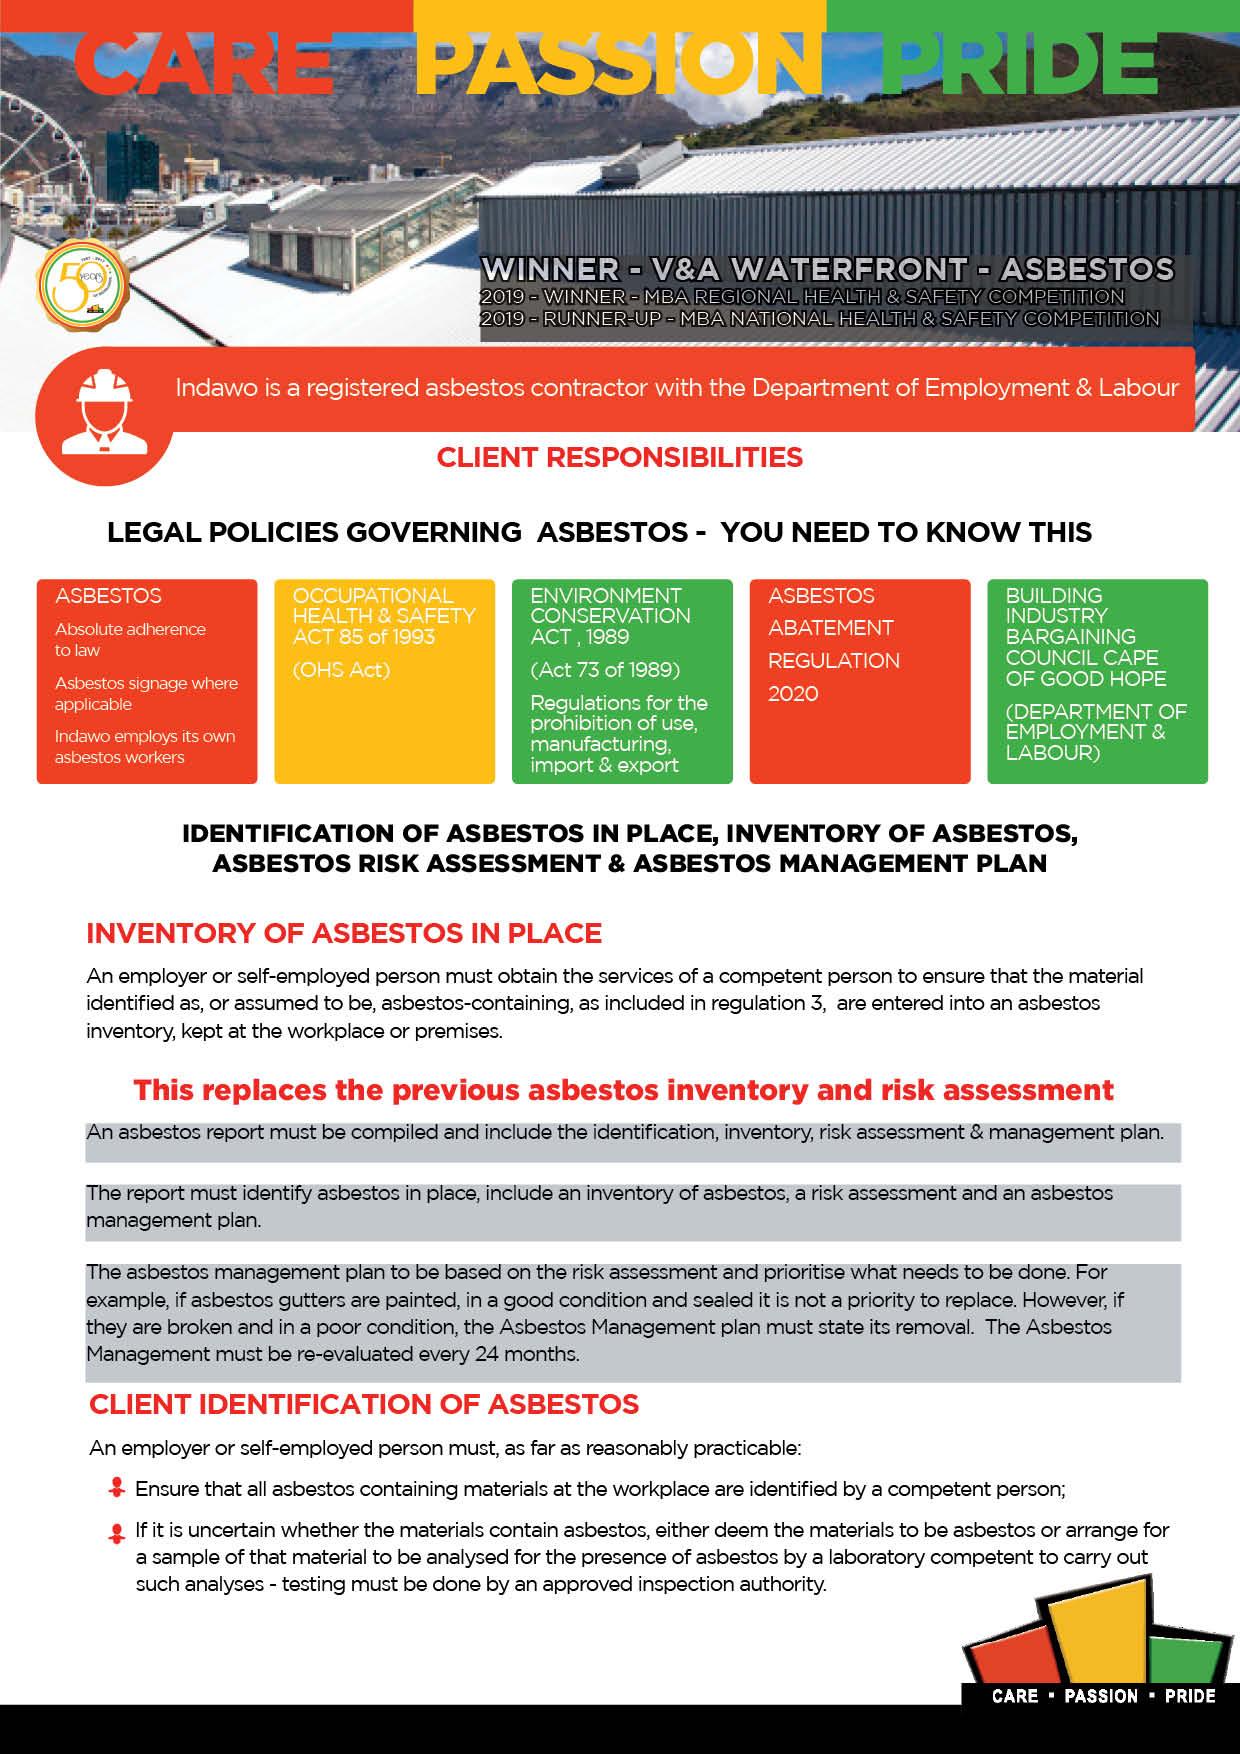 Asbestos Abatement Regulations 2020 Cape Town Western Cape asbestos management